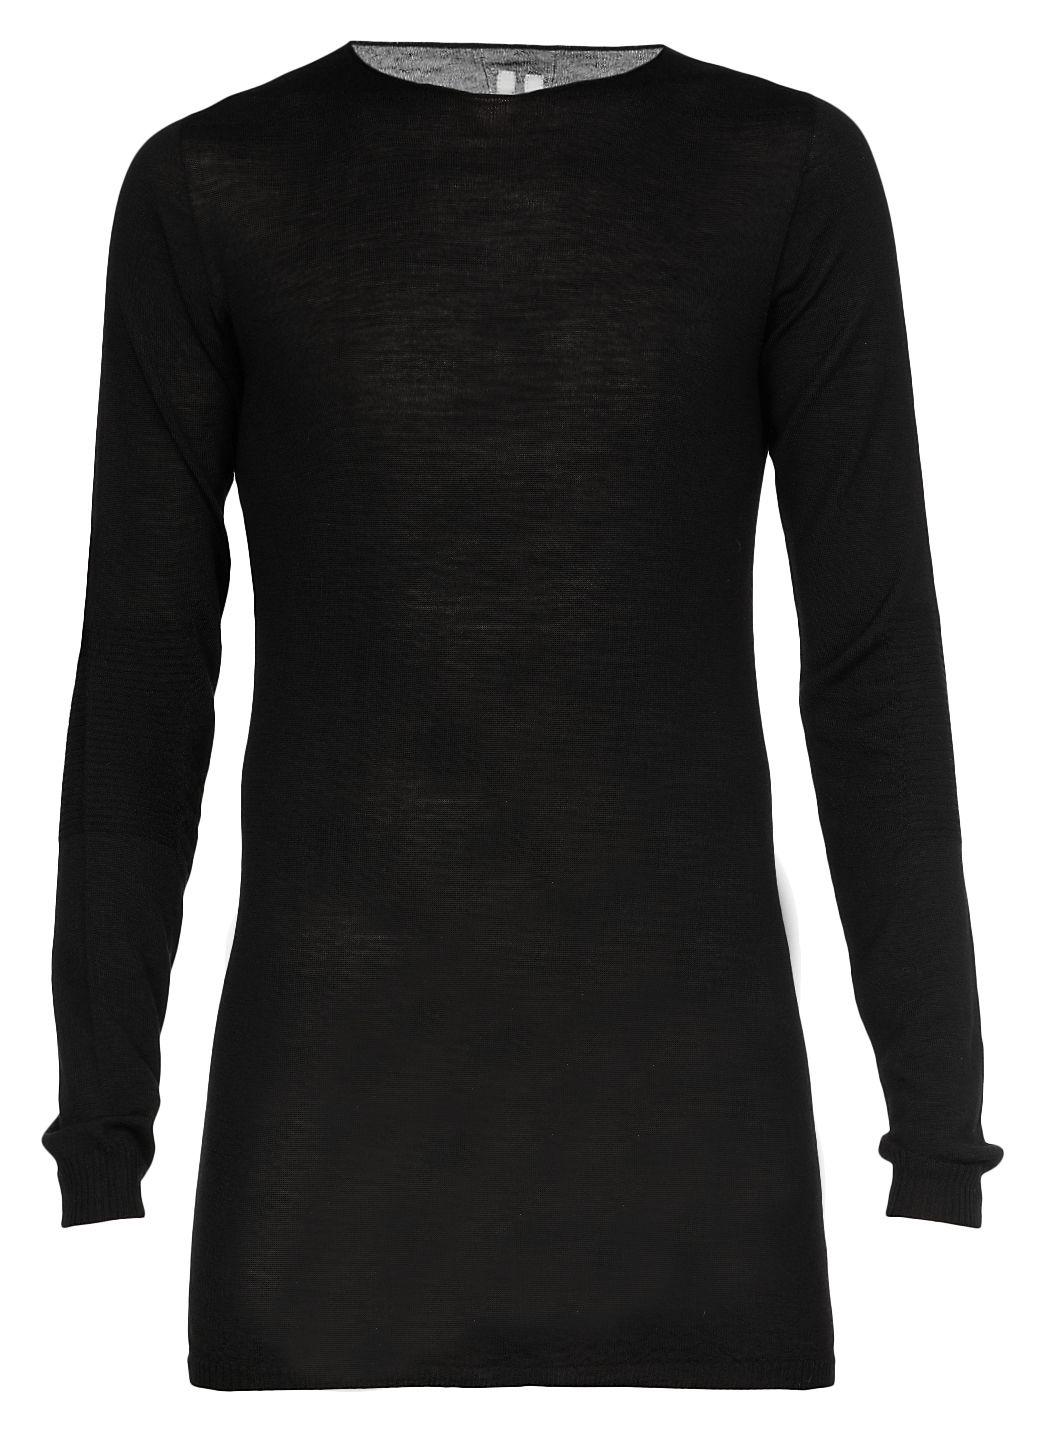 Maglia in lana vergine